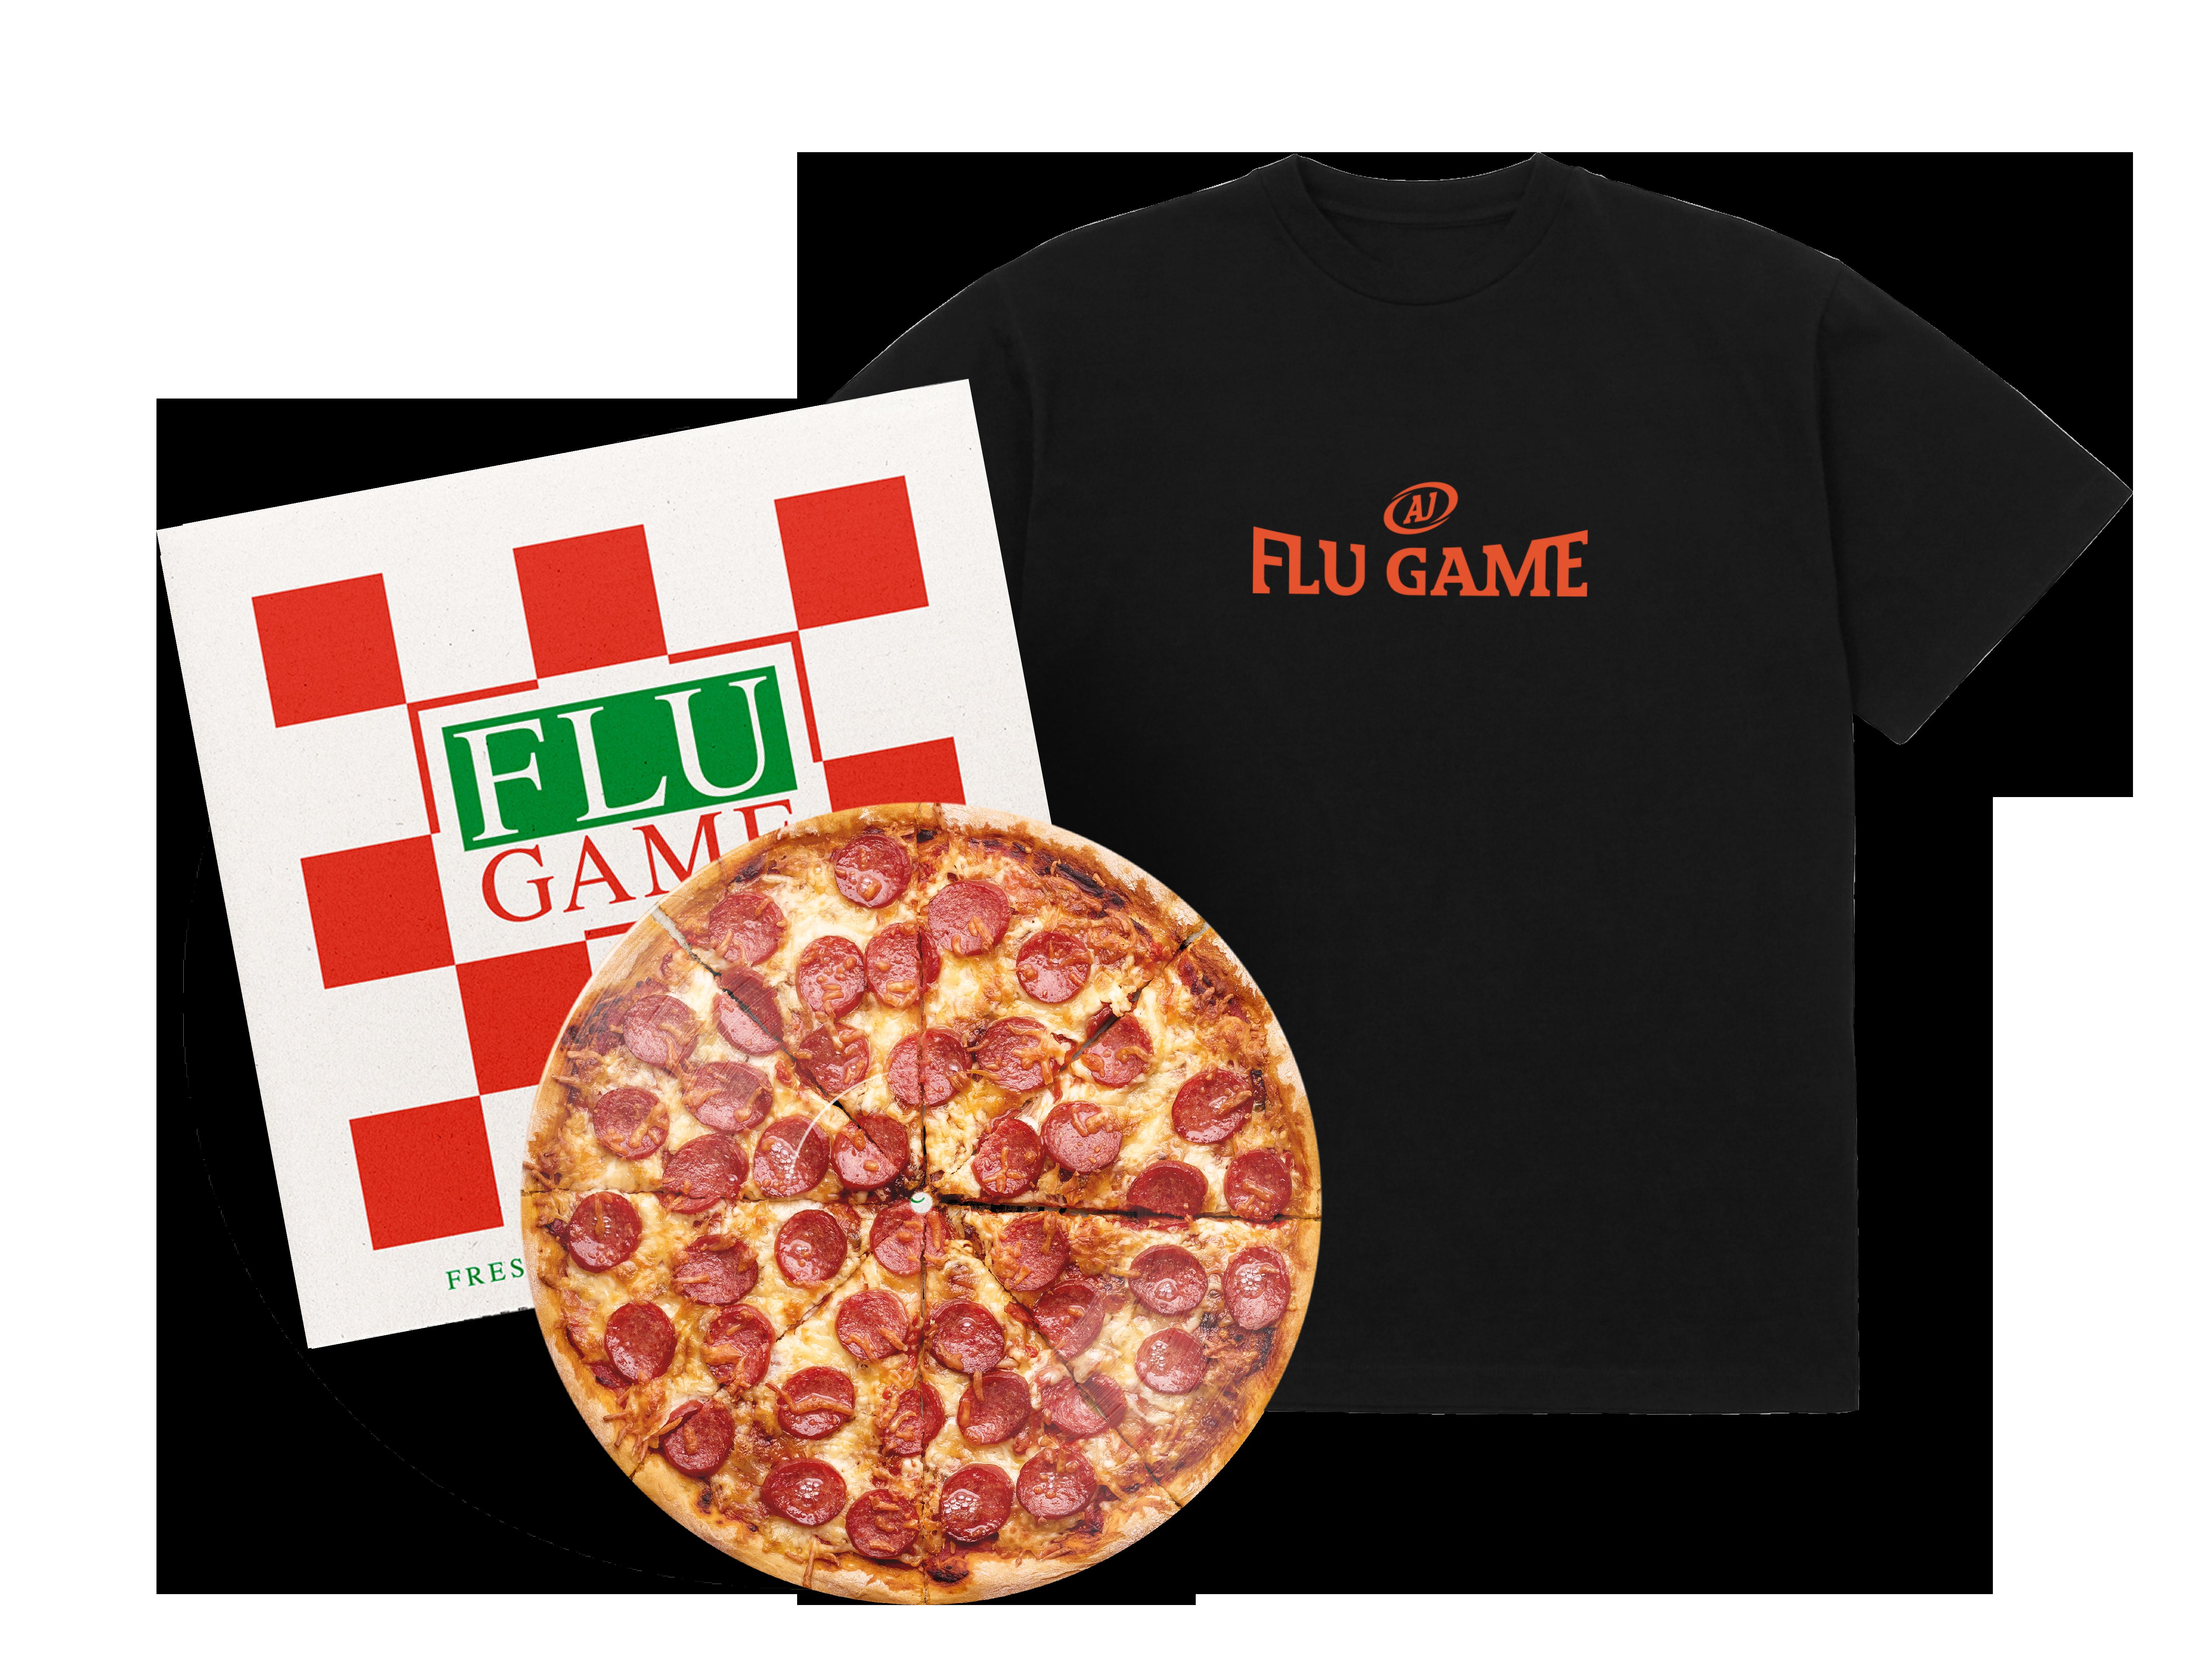 Flu Game Limited Edition LP + T-Shirt Bundle - Black